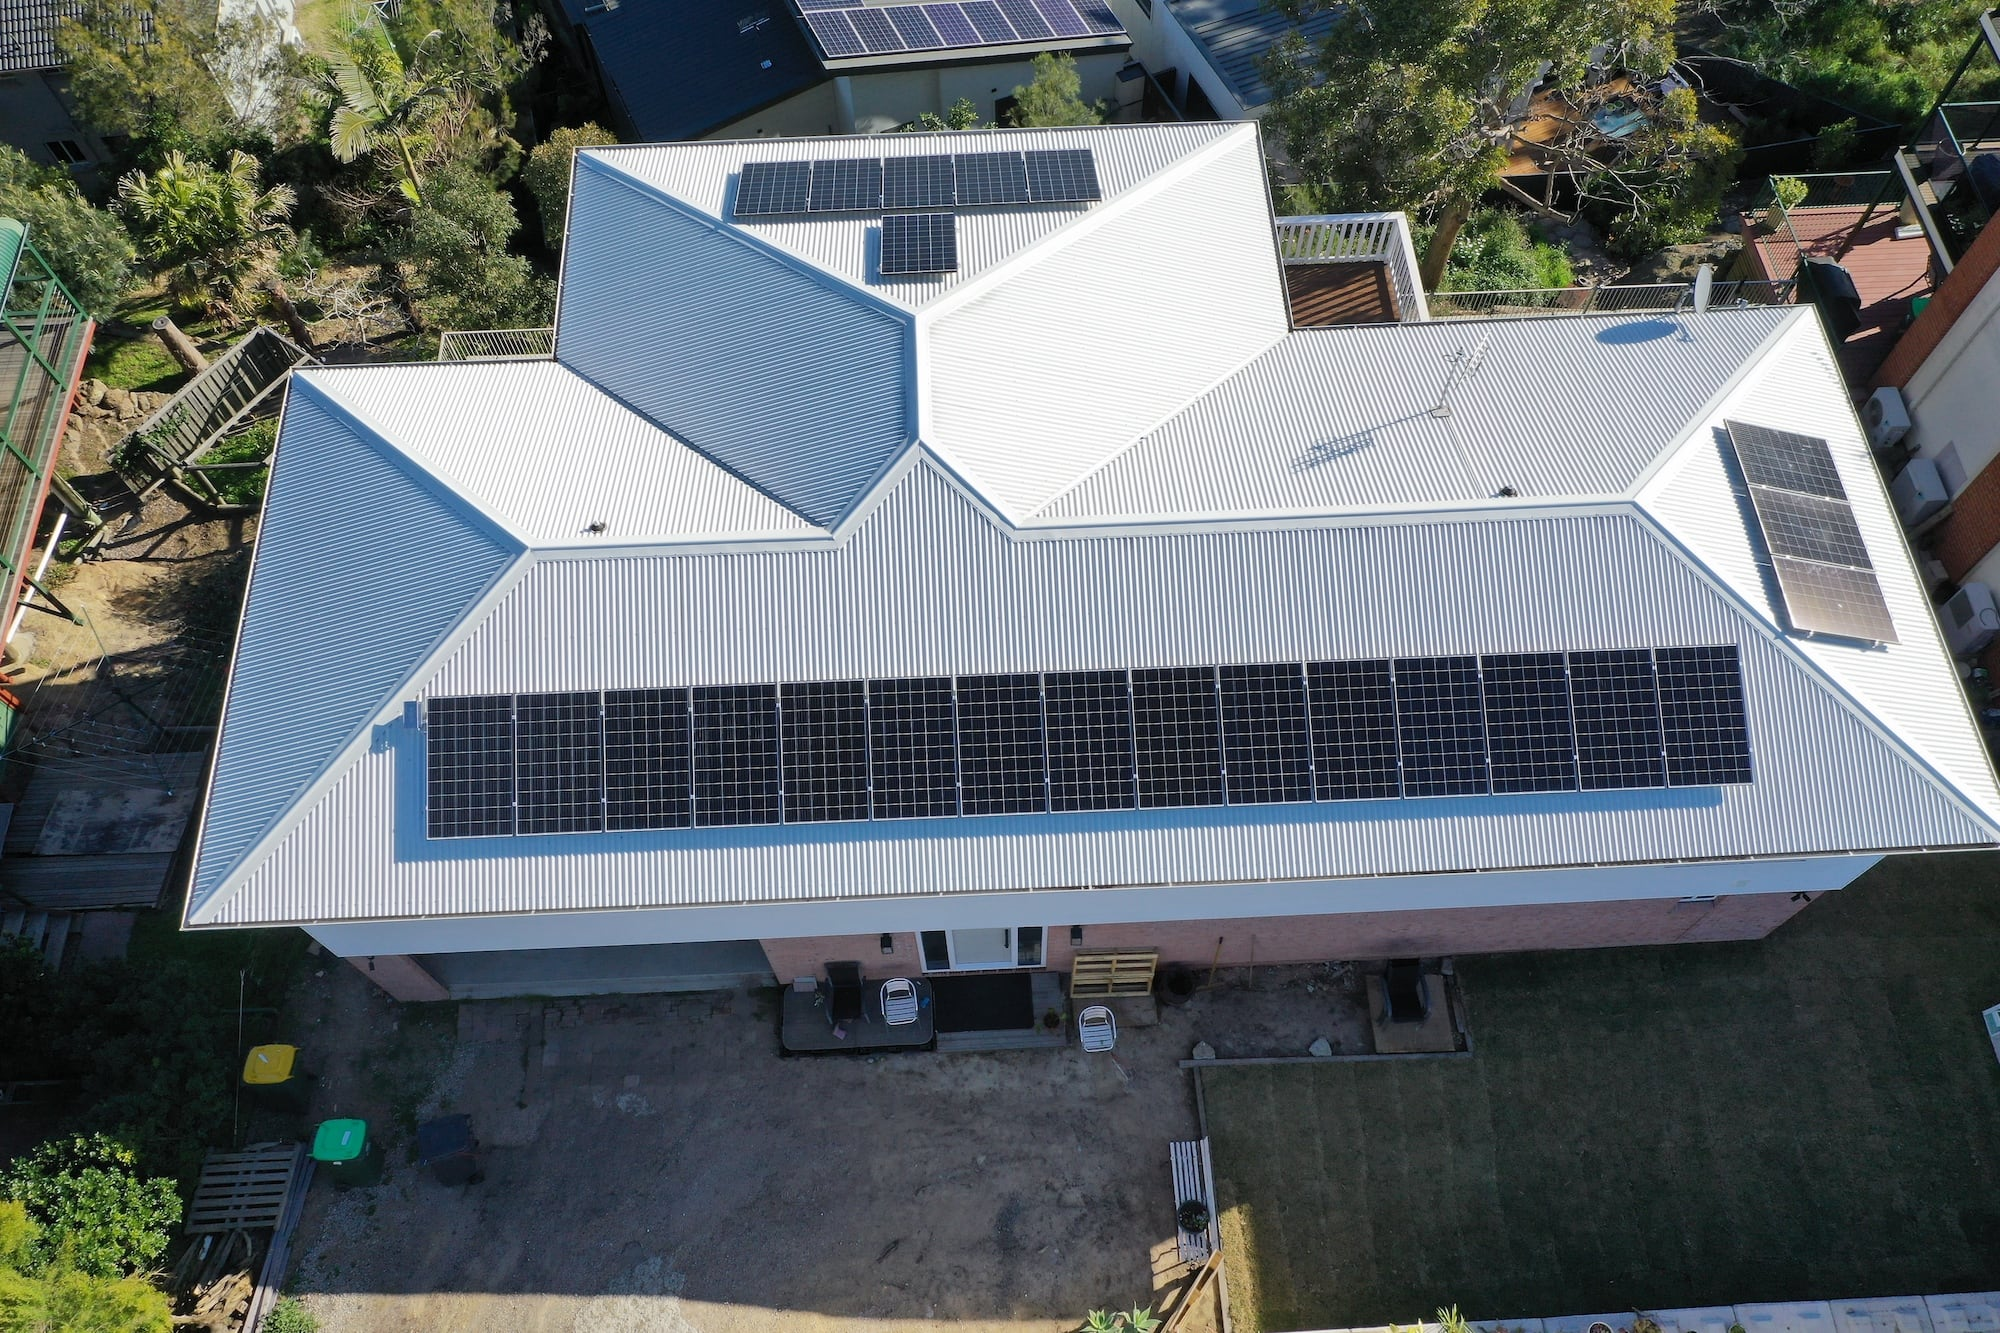 aztech solar panel installation_august 6